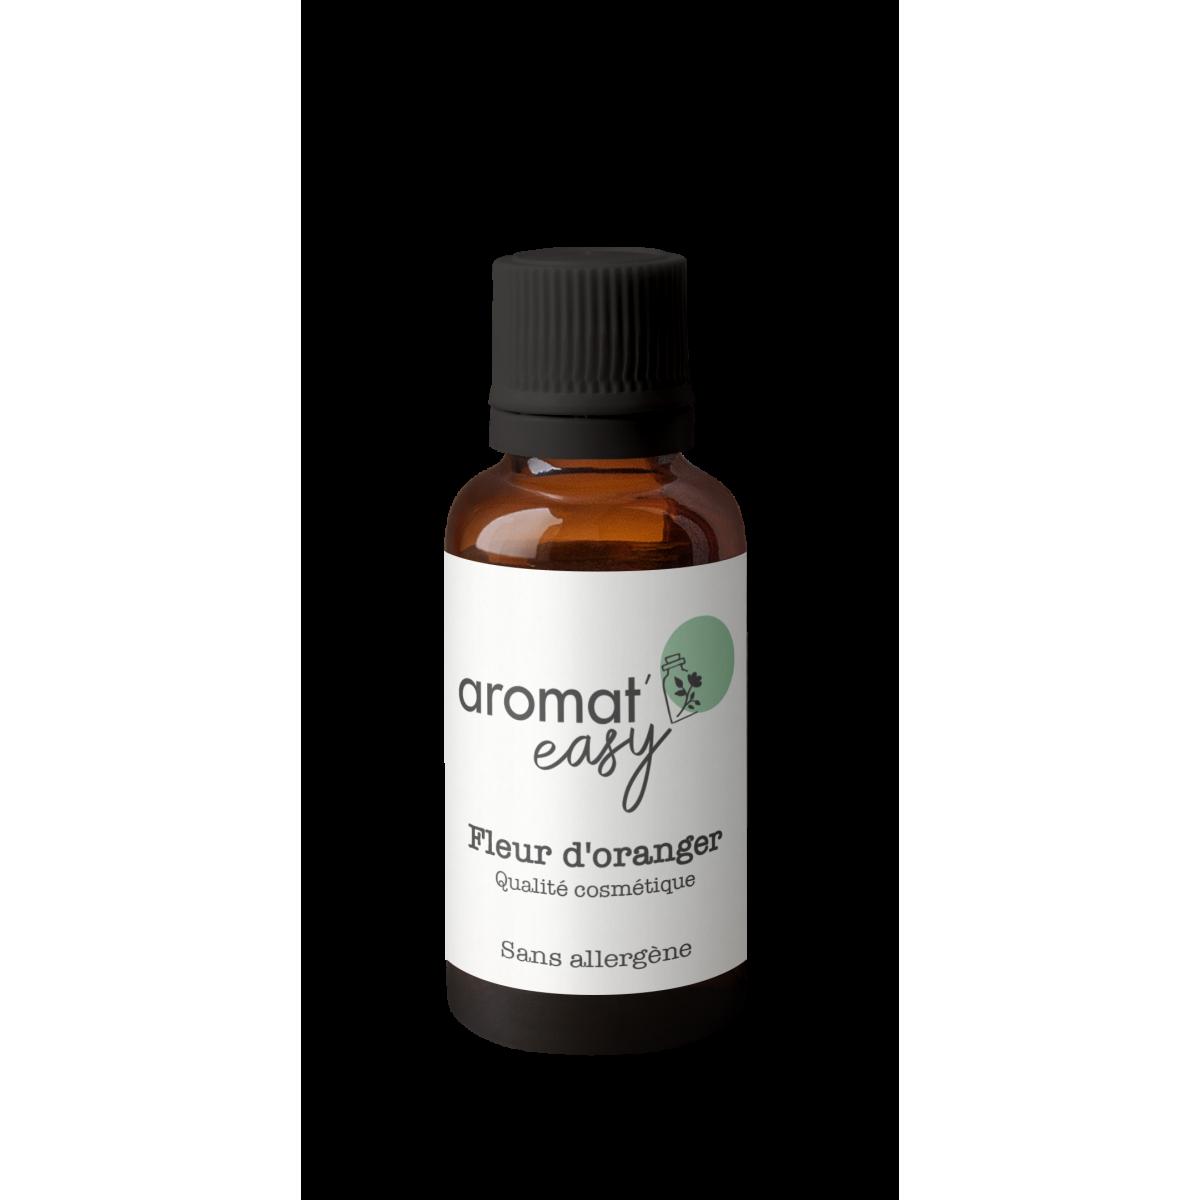 Fragrance Fleur d'oranger Sans allergène